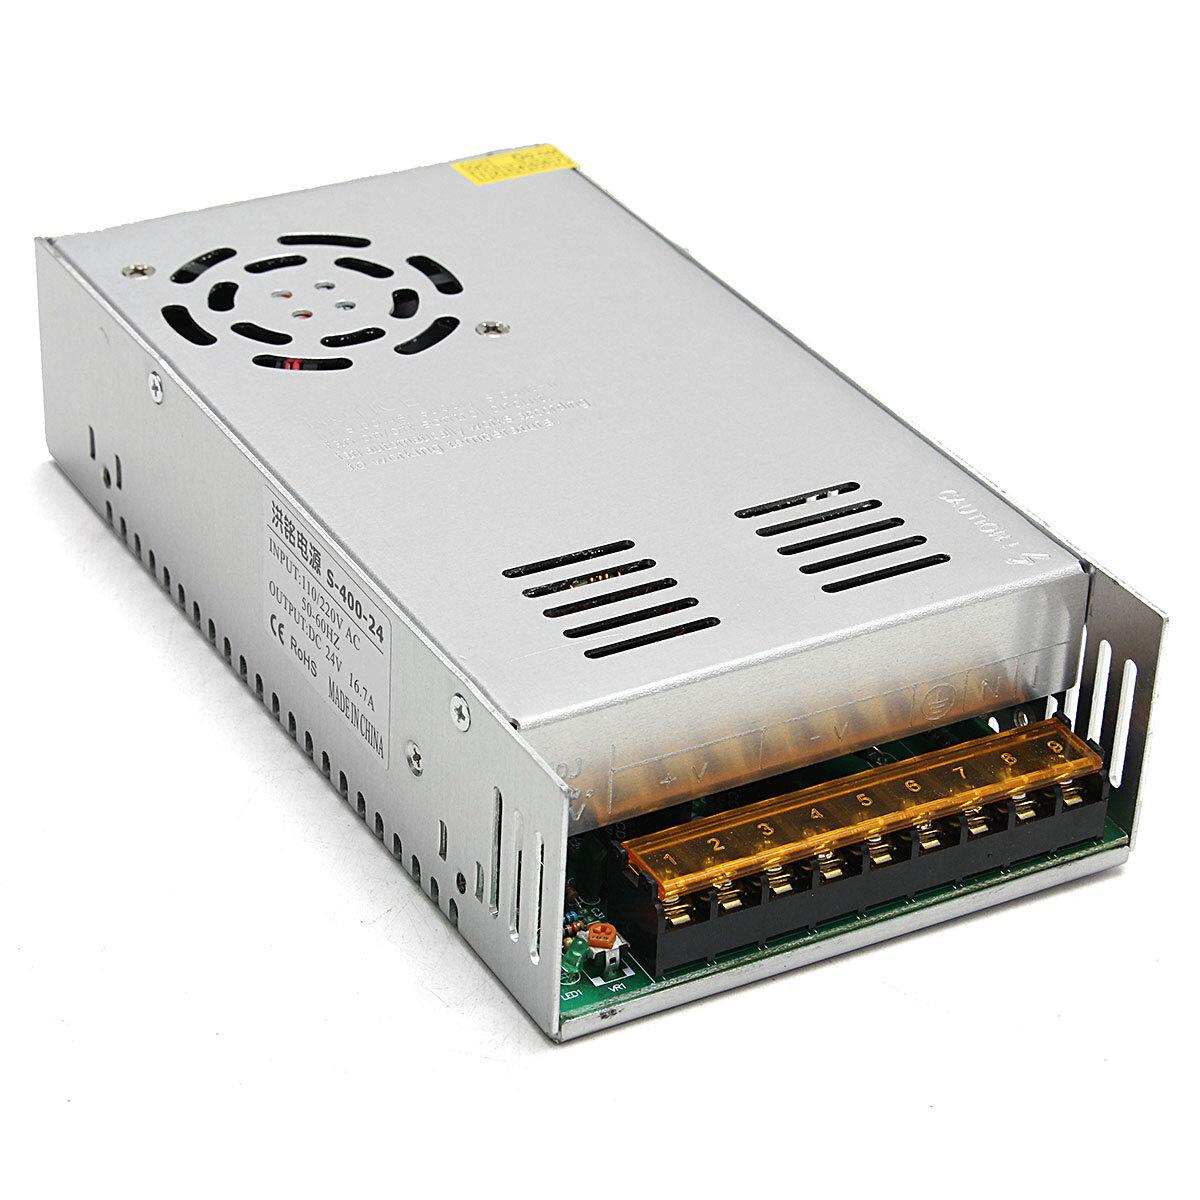 Geekcreit®AC 110-240V入力DC 24V 17A 360Wスイッチング電源ドライバボード